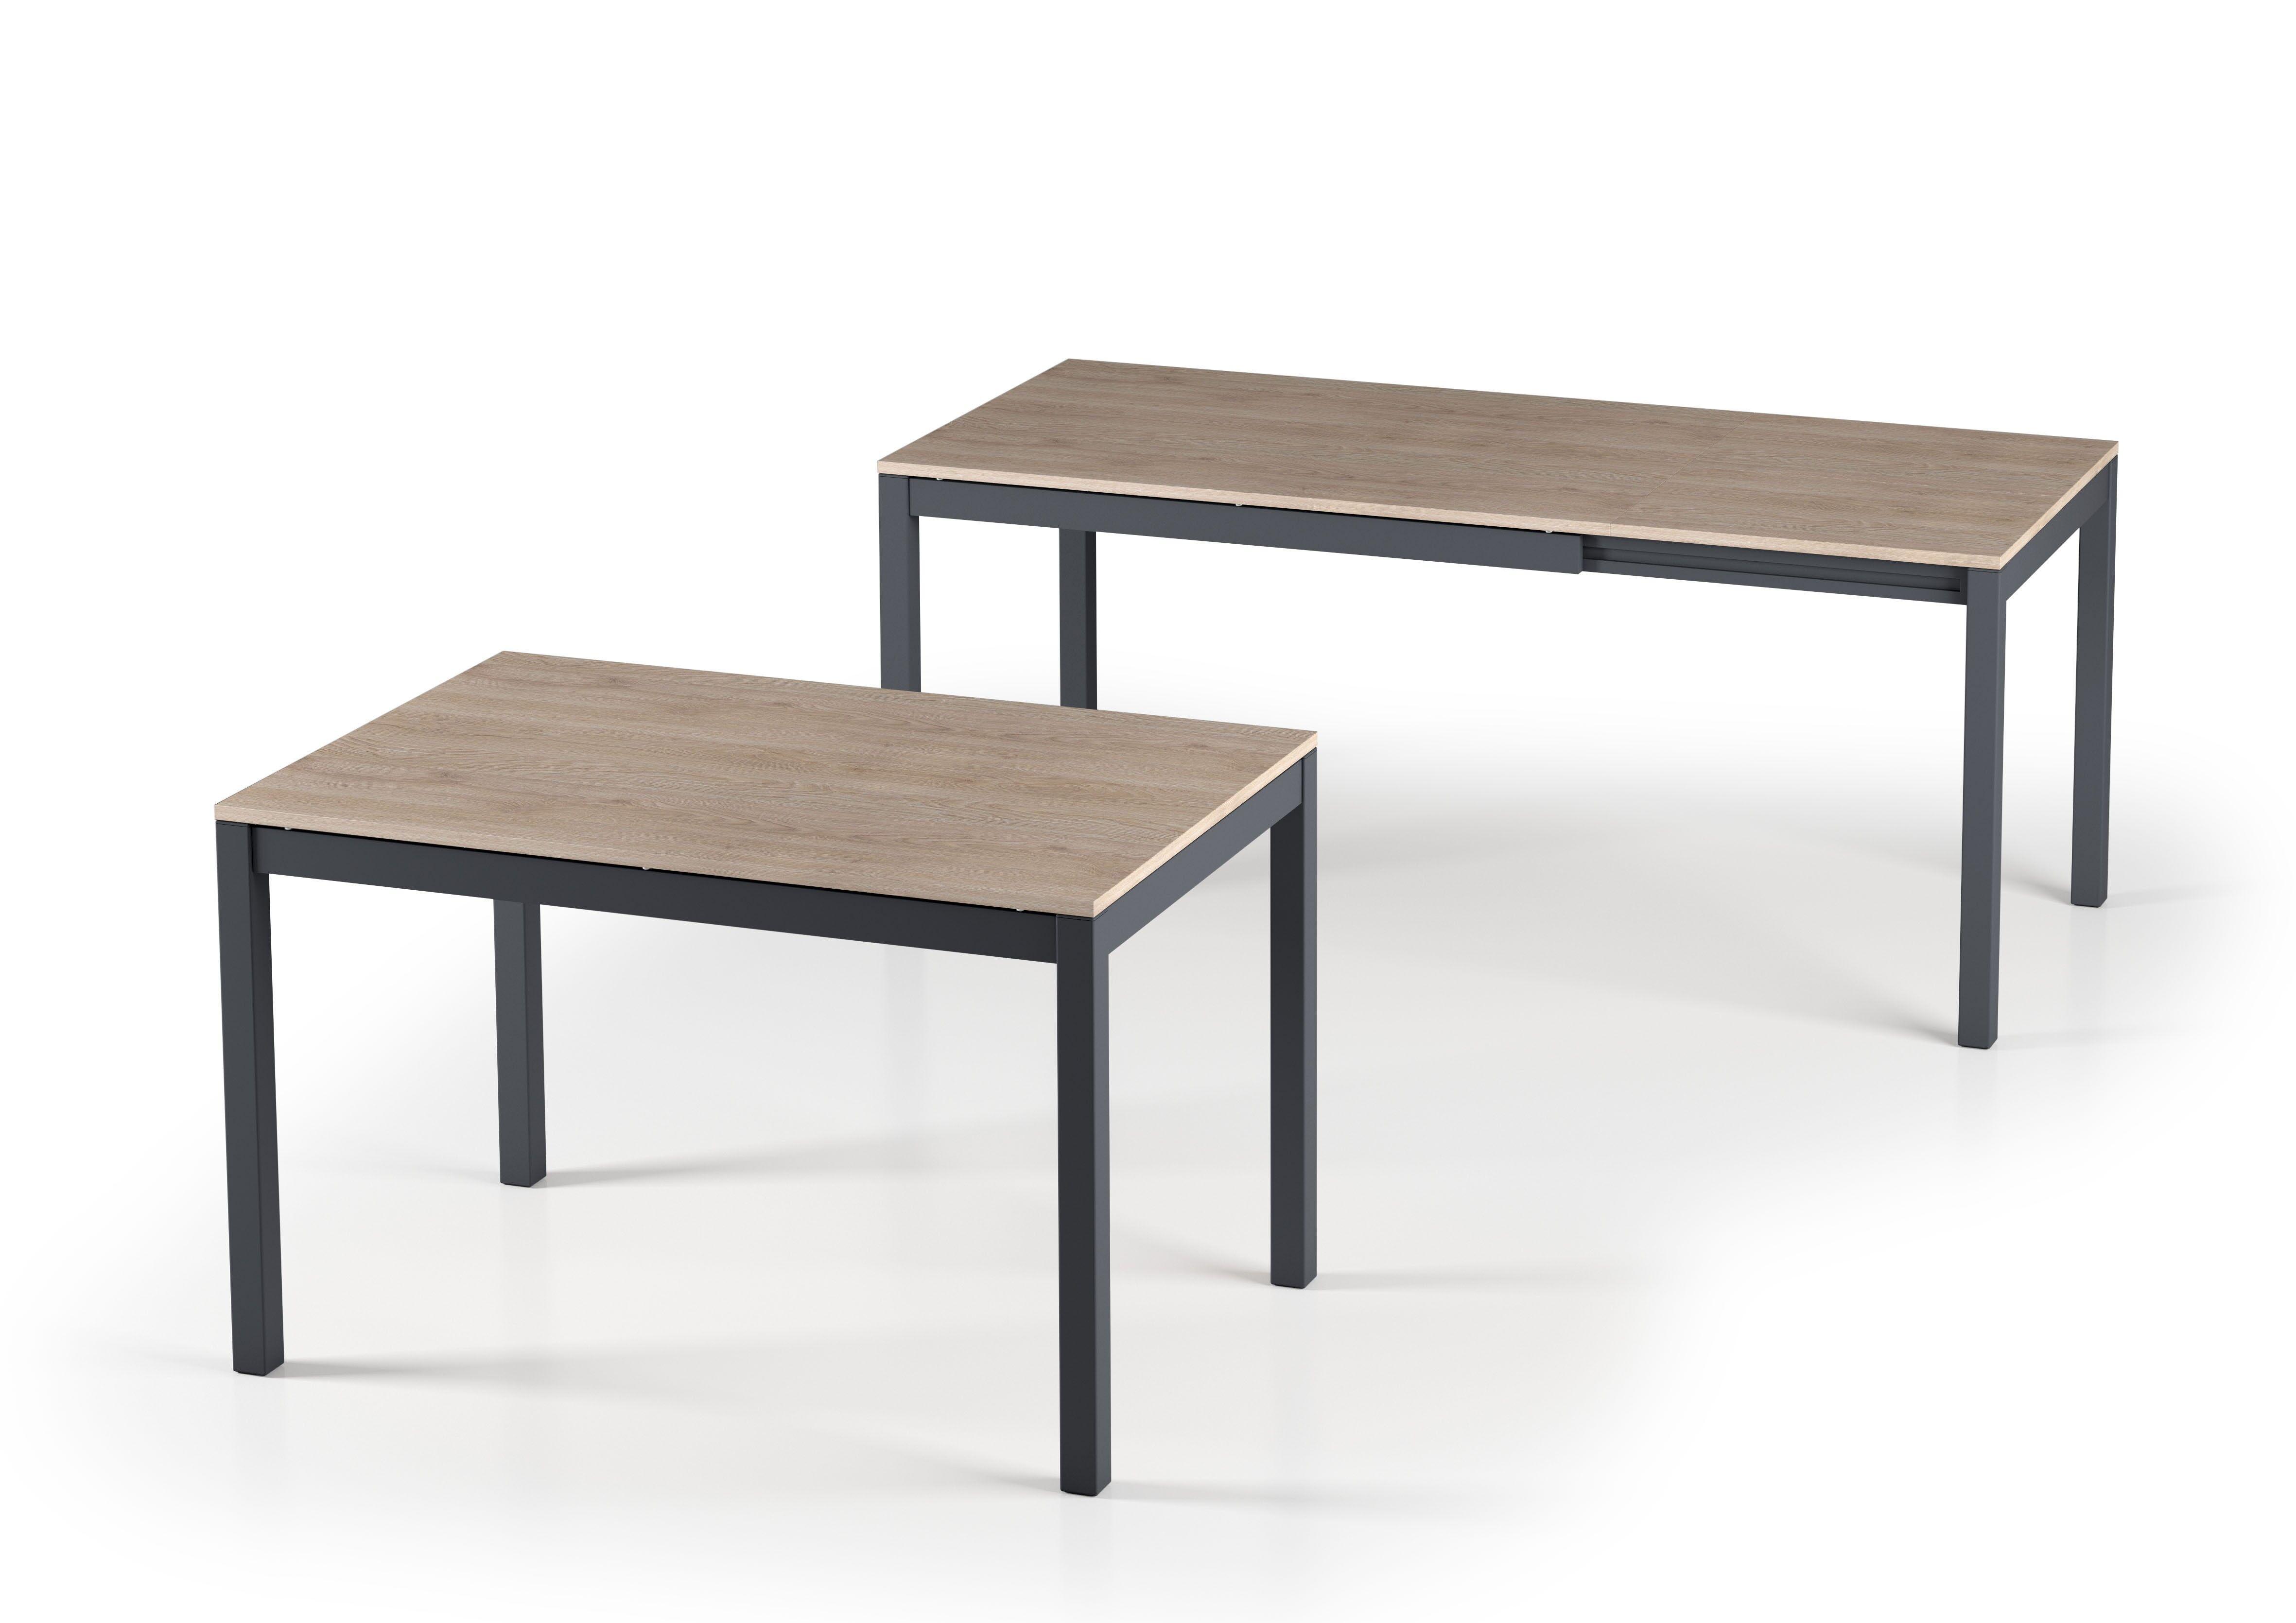 CAESAROO Table 121x81 cm extensible Chêne clair    Chêne clair